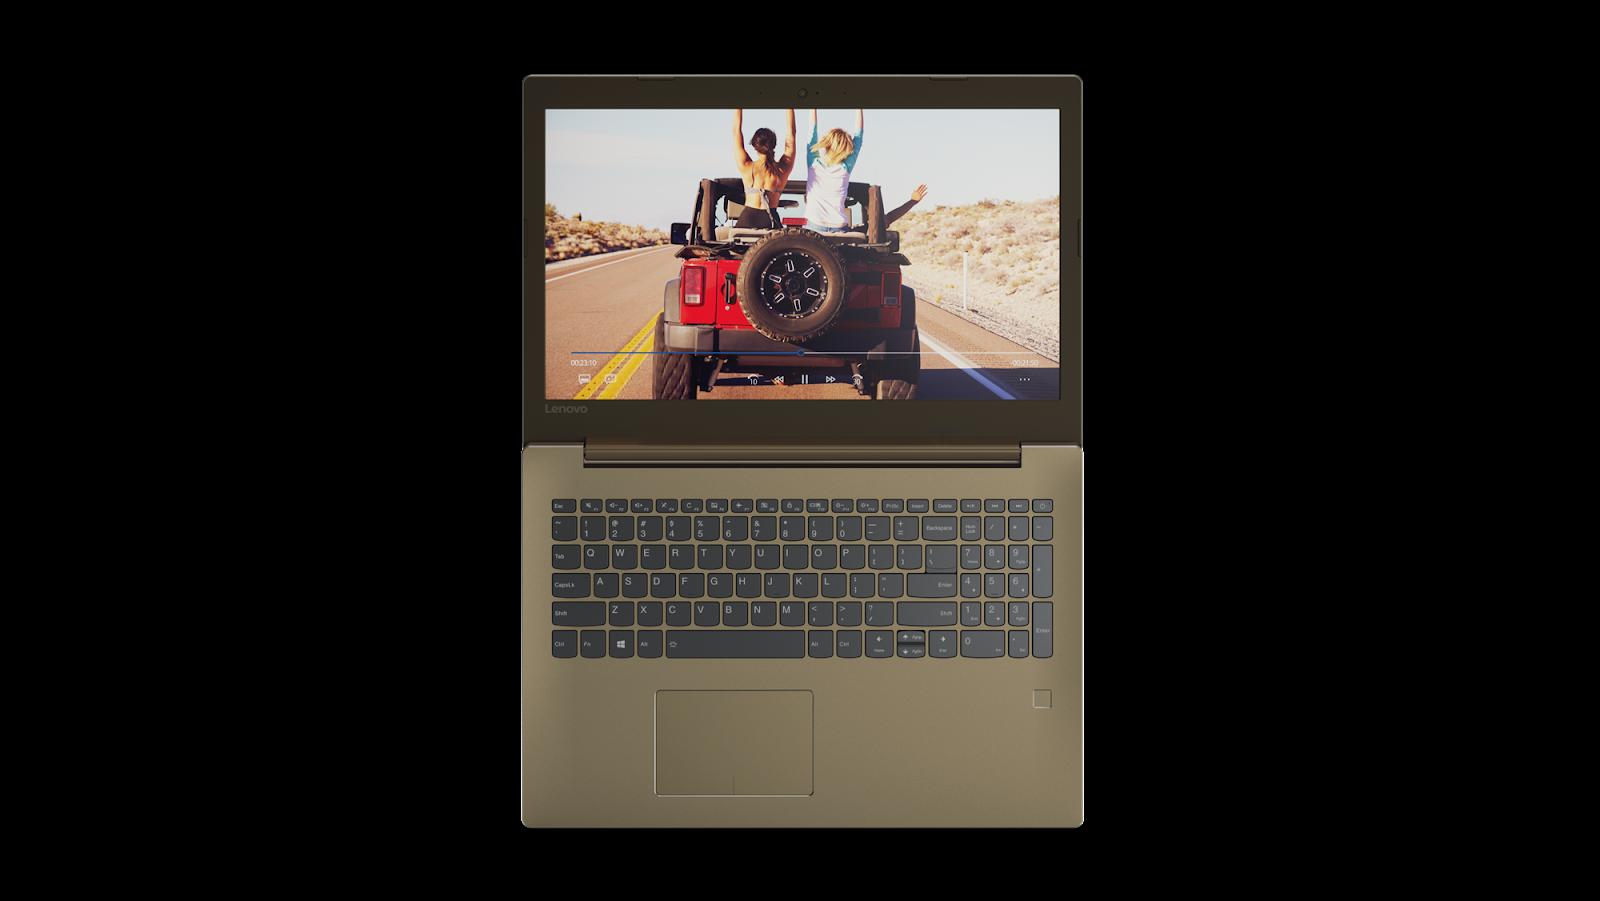 Фото 2 - Ноутбук Lenovo IdeaPad 520-15IKB Bronze (80YL00STRA)